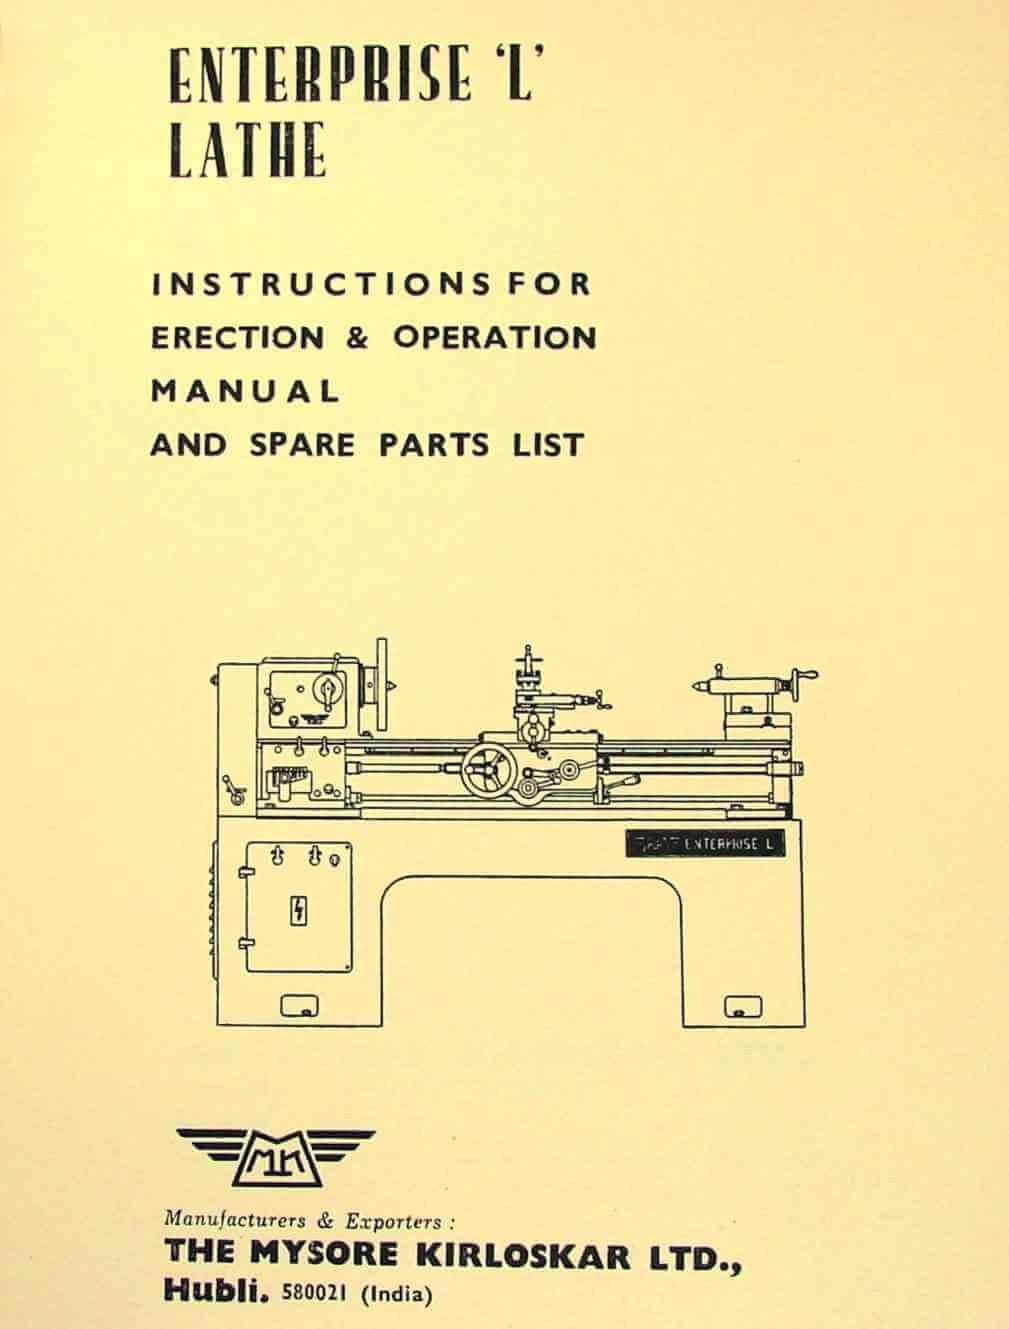 hight resolution of mysore kirloskar l1 l2 enterprise 15 lathe instructions and parts manual